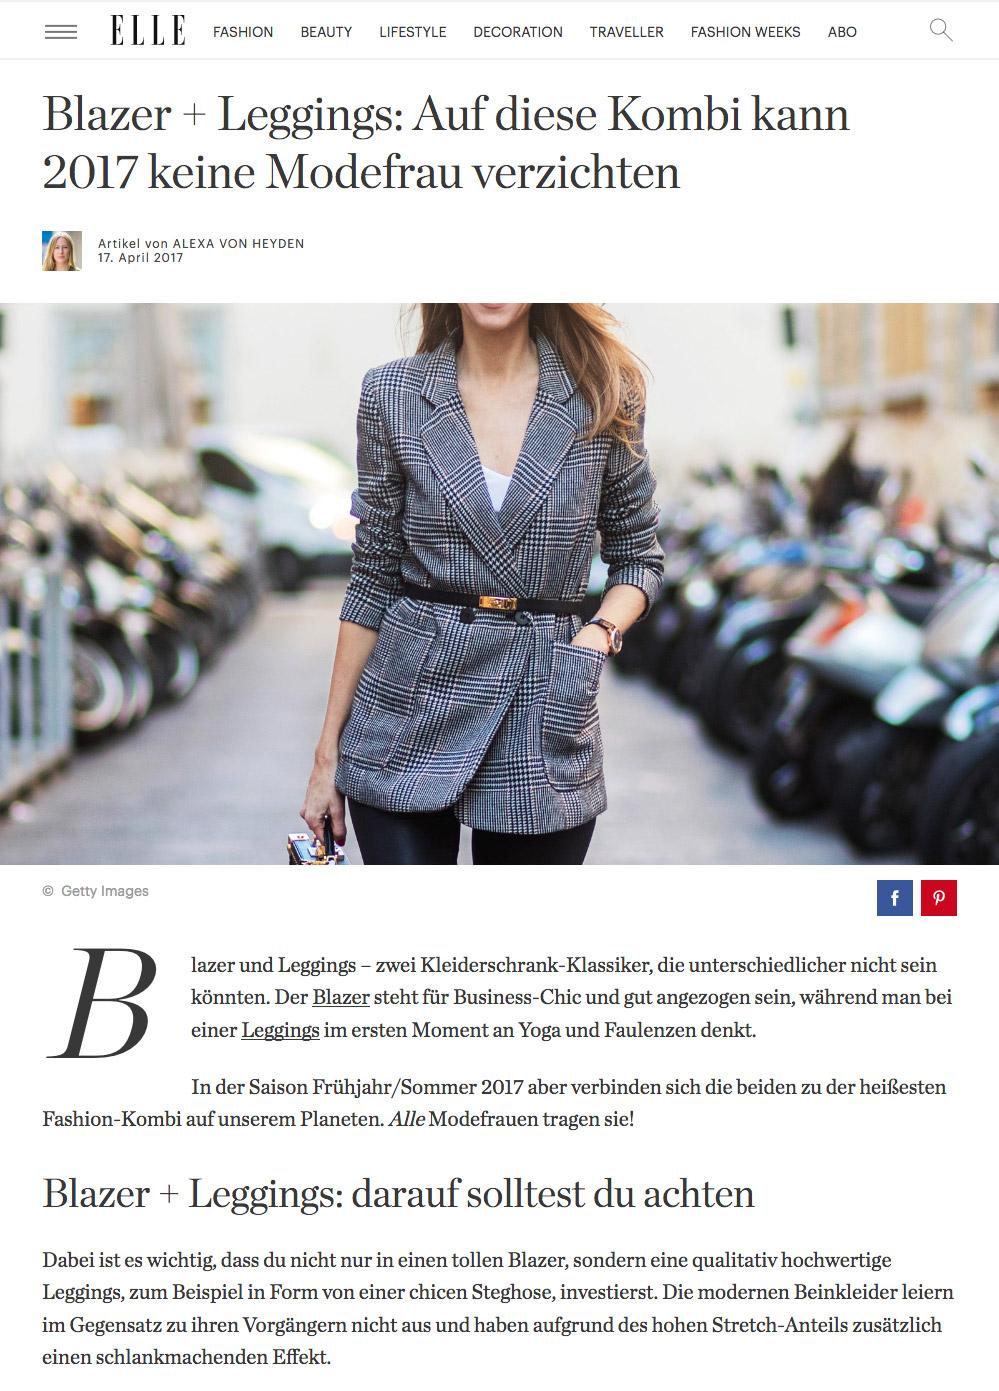 Blazer und Legging: Die Trend-Kombi 2017 - ELLE - 2017 04 - Alexandra Lapp - found on http://www.elle.de/blazer-leggings-kombi